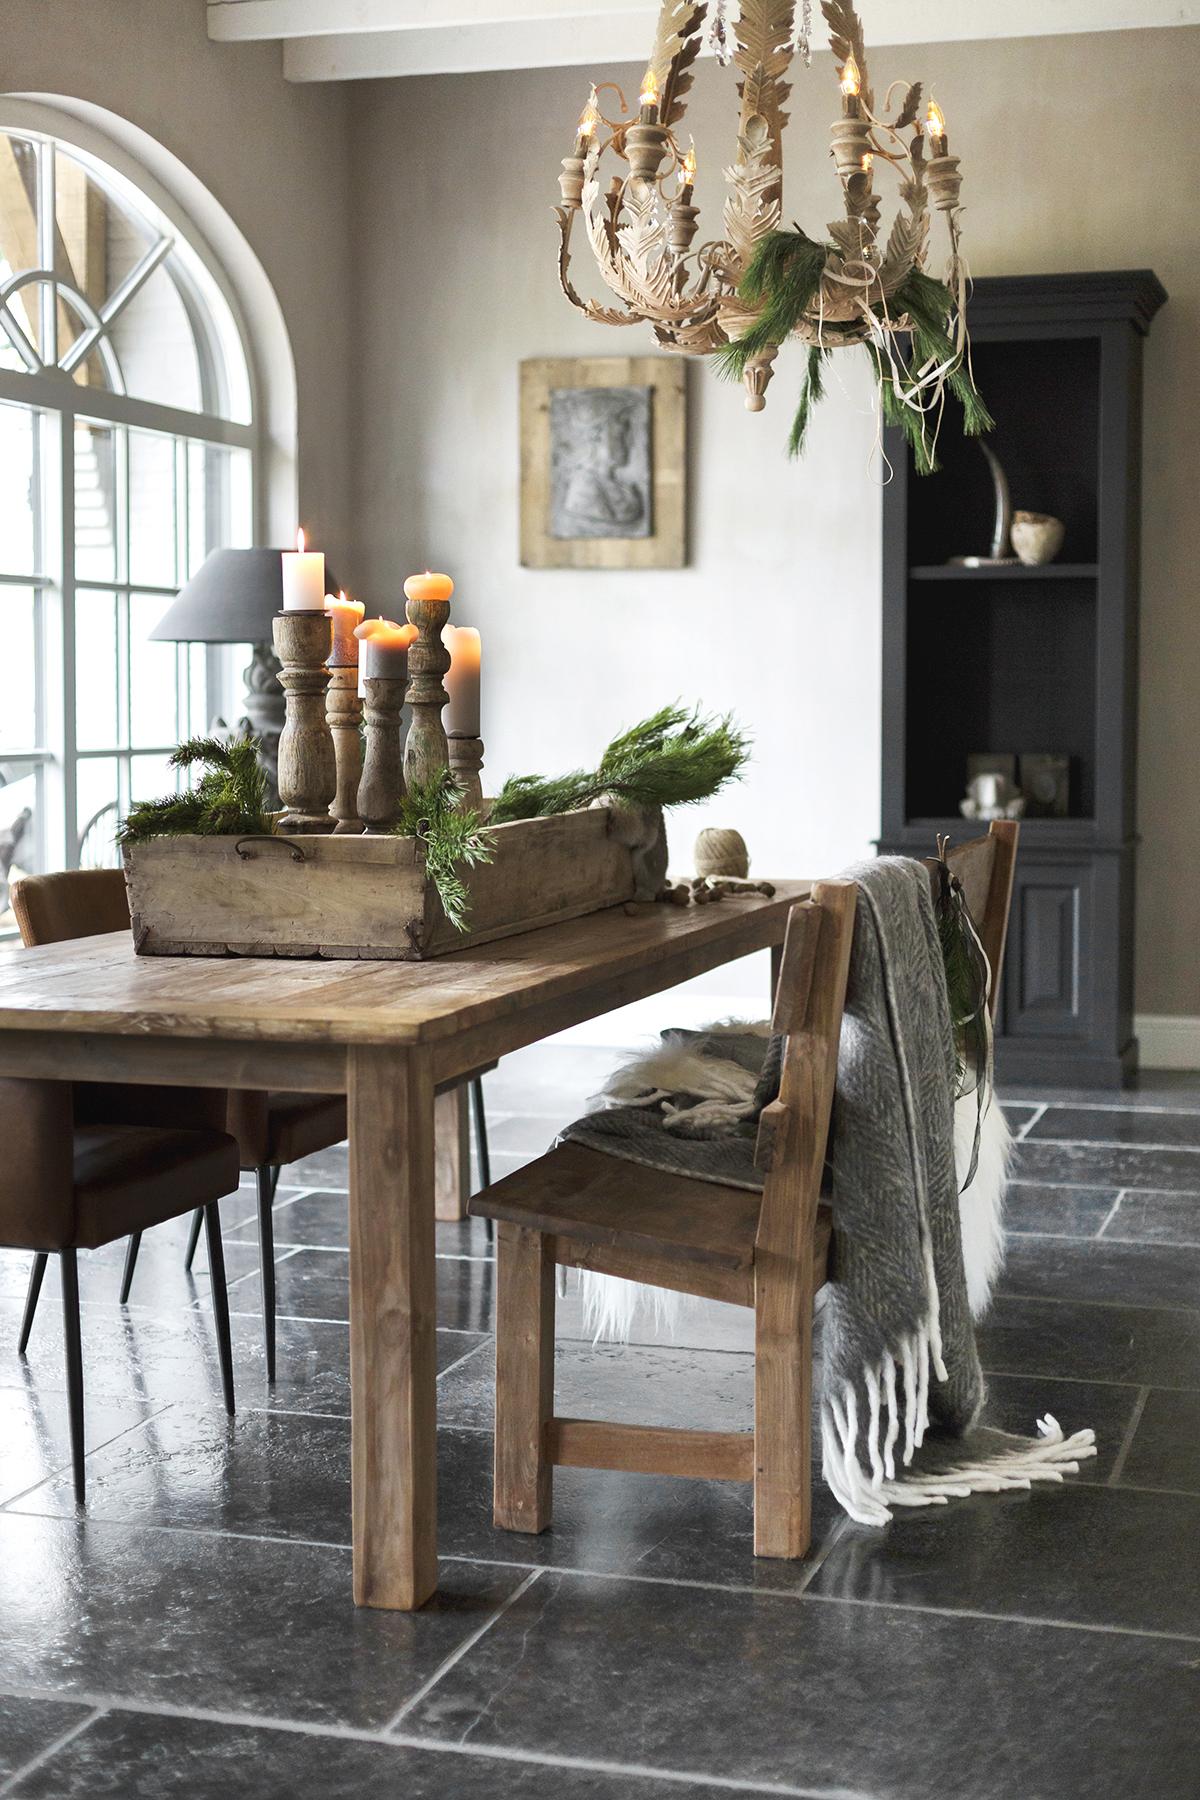 pronkstuk kerst houten bak kandelaars